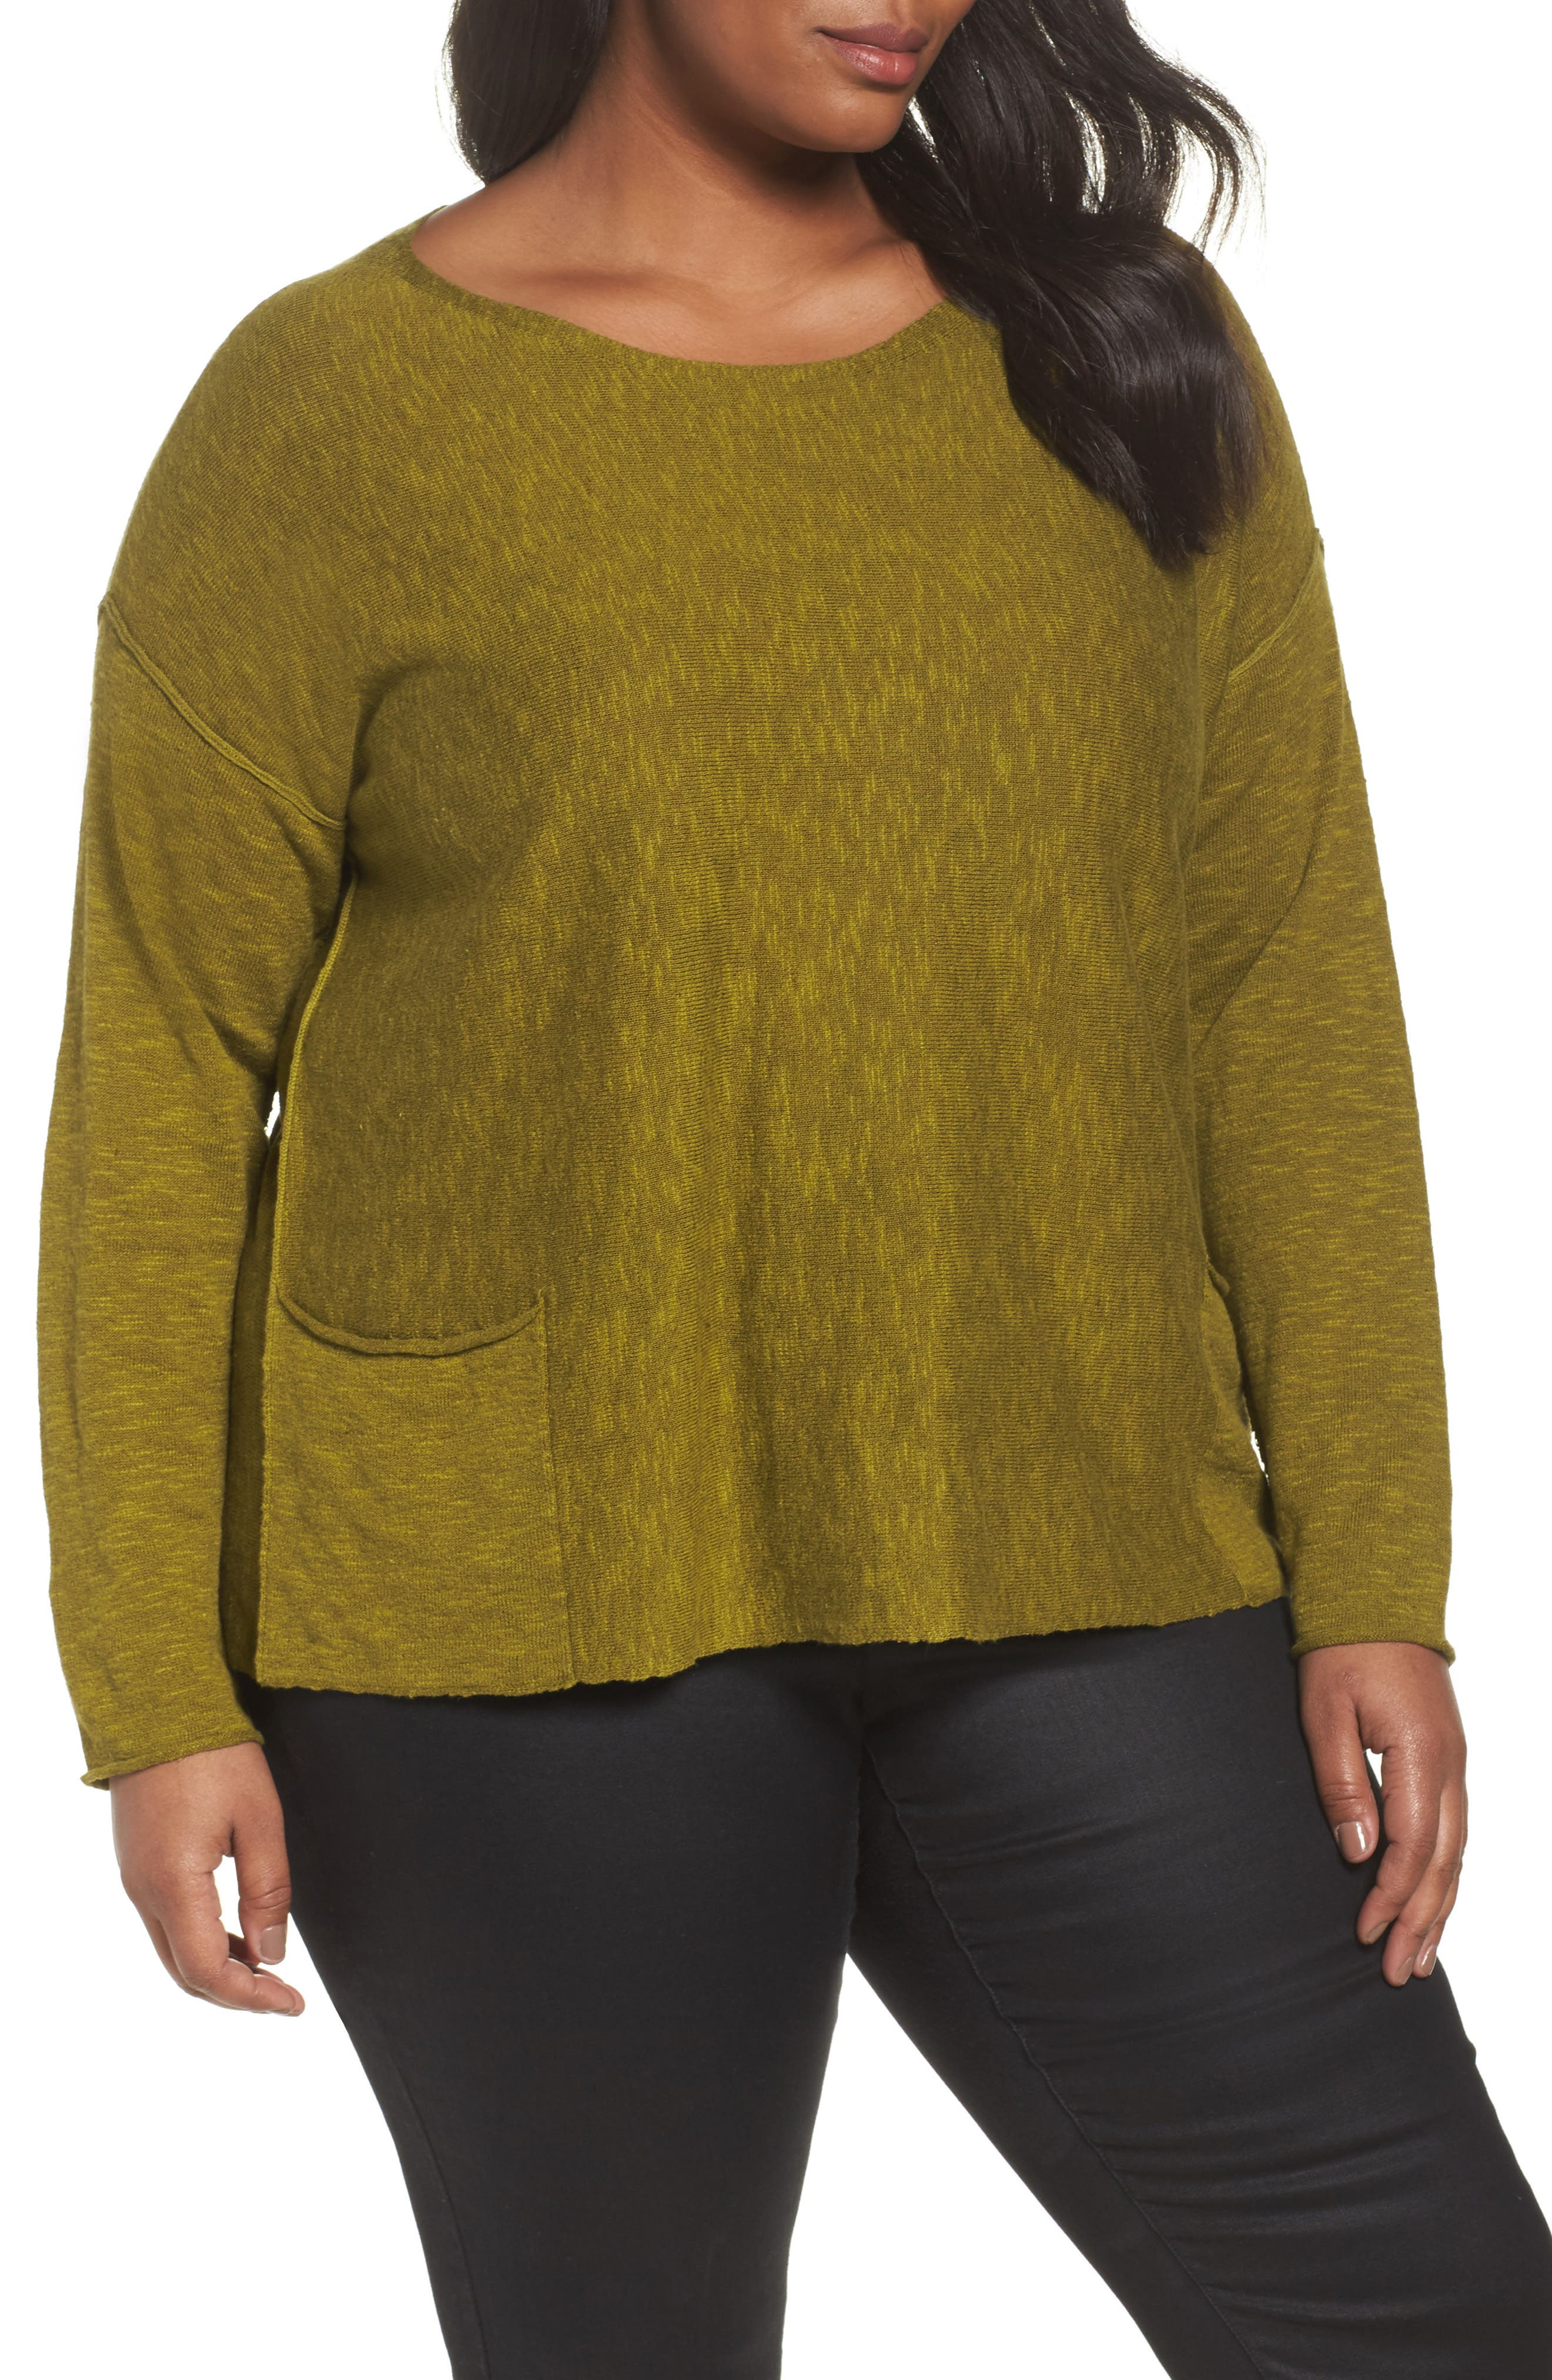 Organic Linen & Cotton Sweater,                             Main thumbnail 1, color,                             201